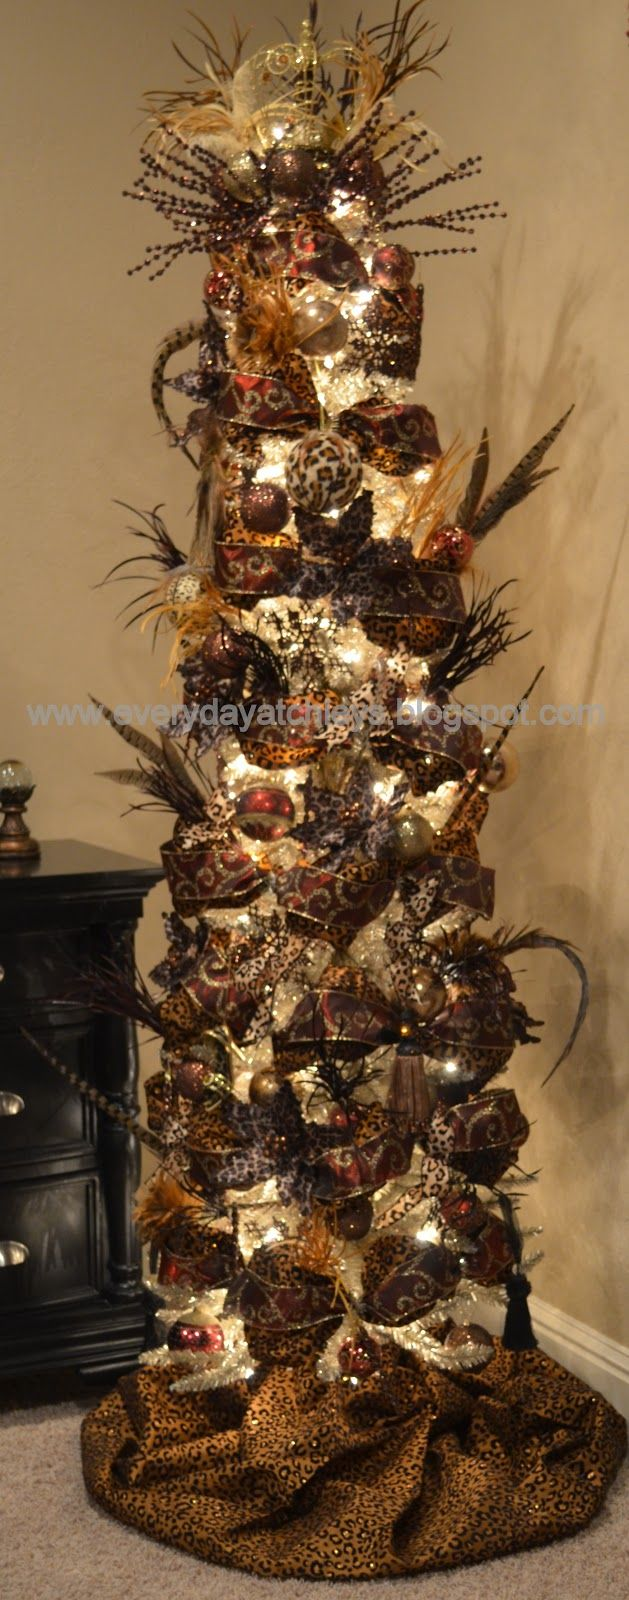 A Leopard Print Christmas Tree! Omg!! Michael would kill me though.